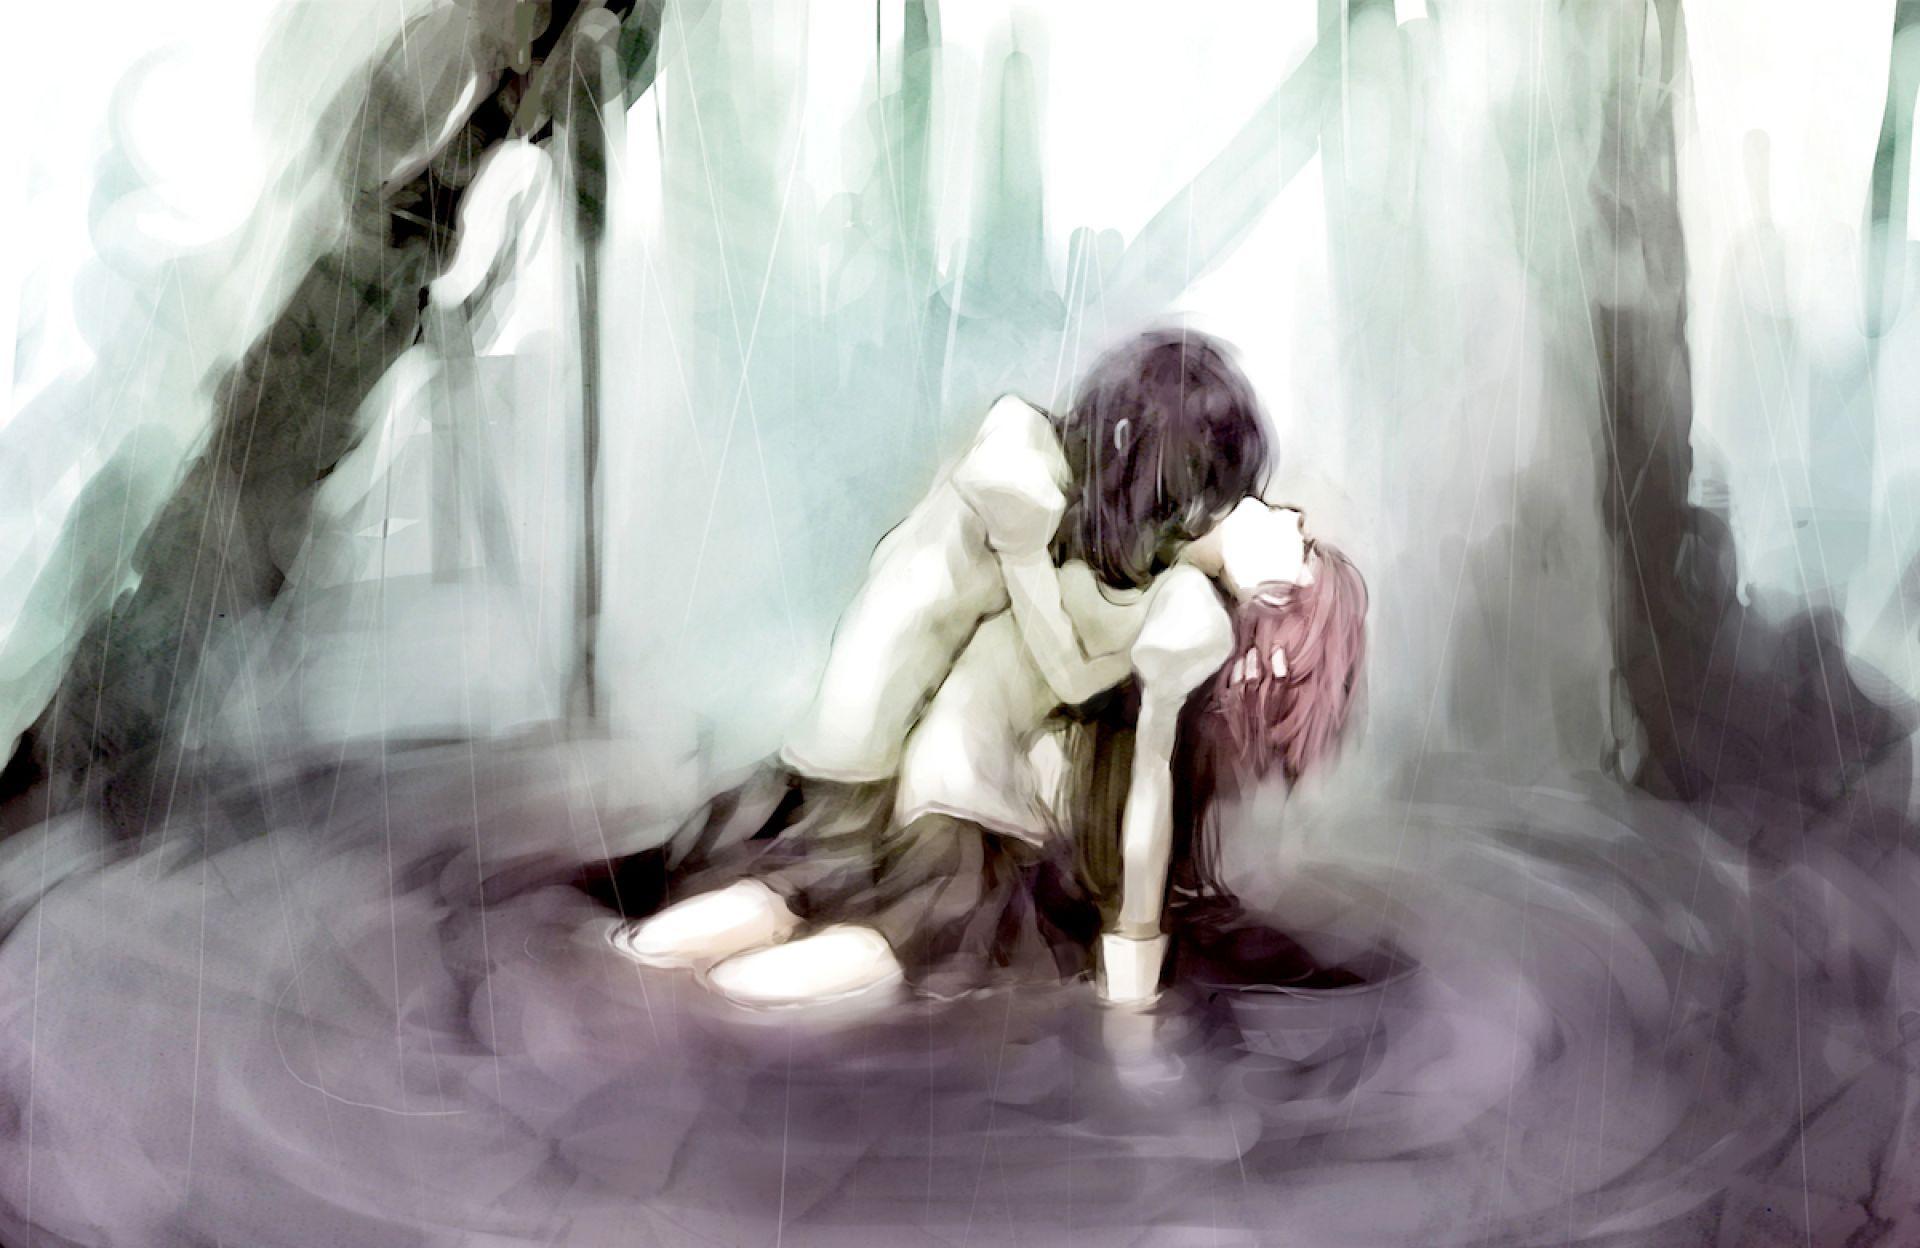 Dessin Manga Couple Triste Dessin De Manga